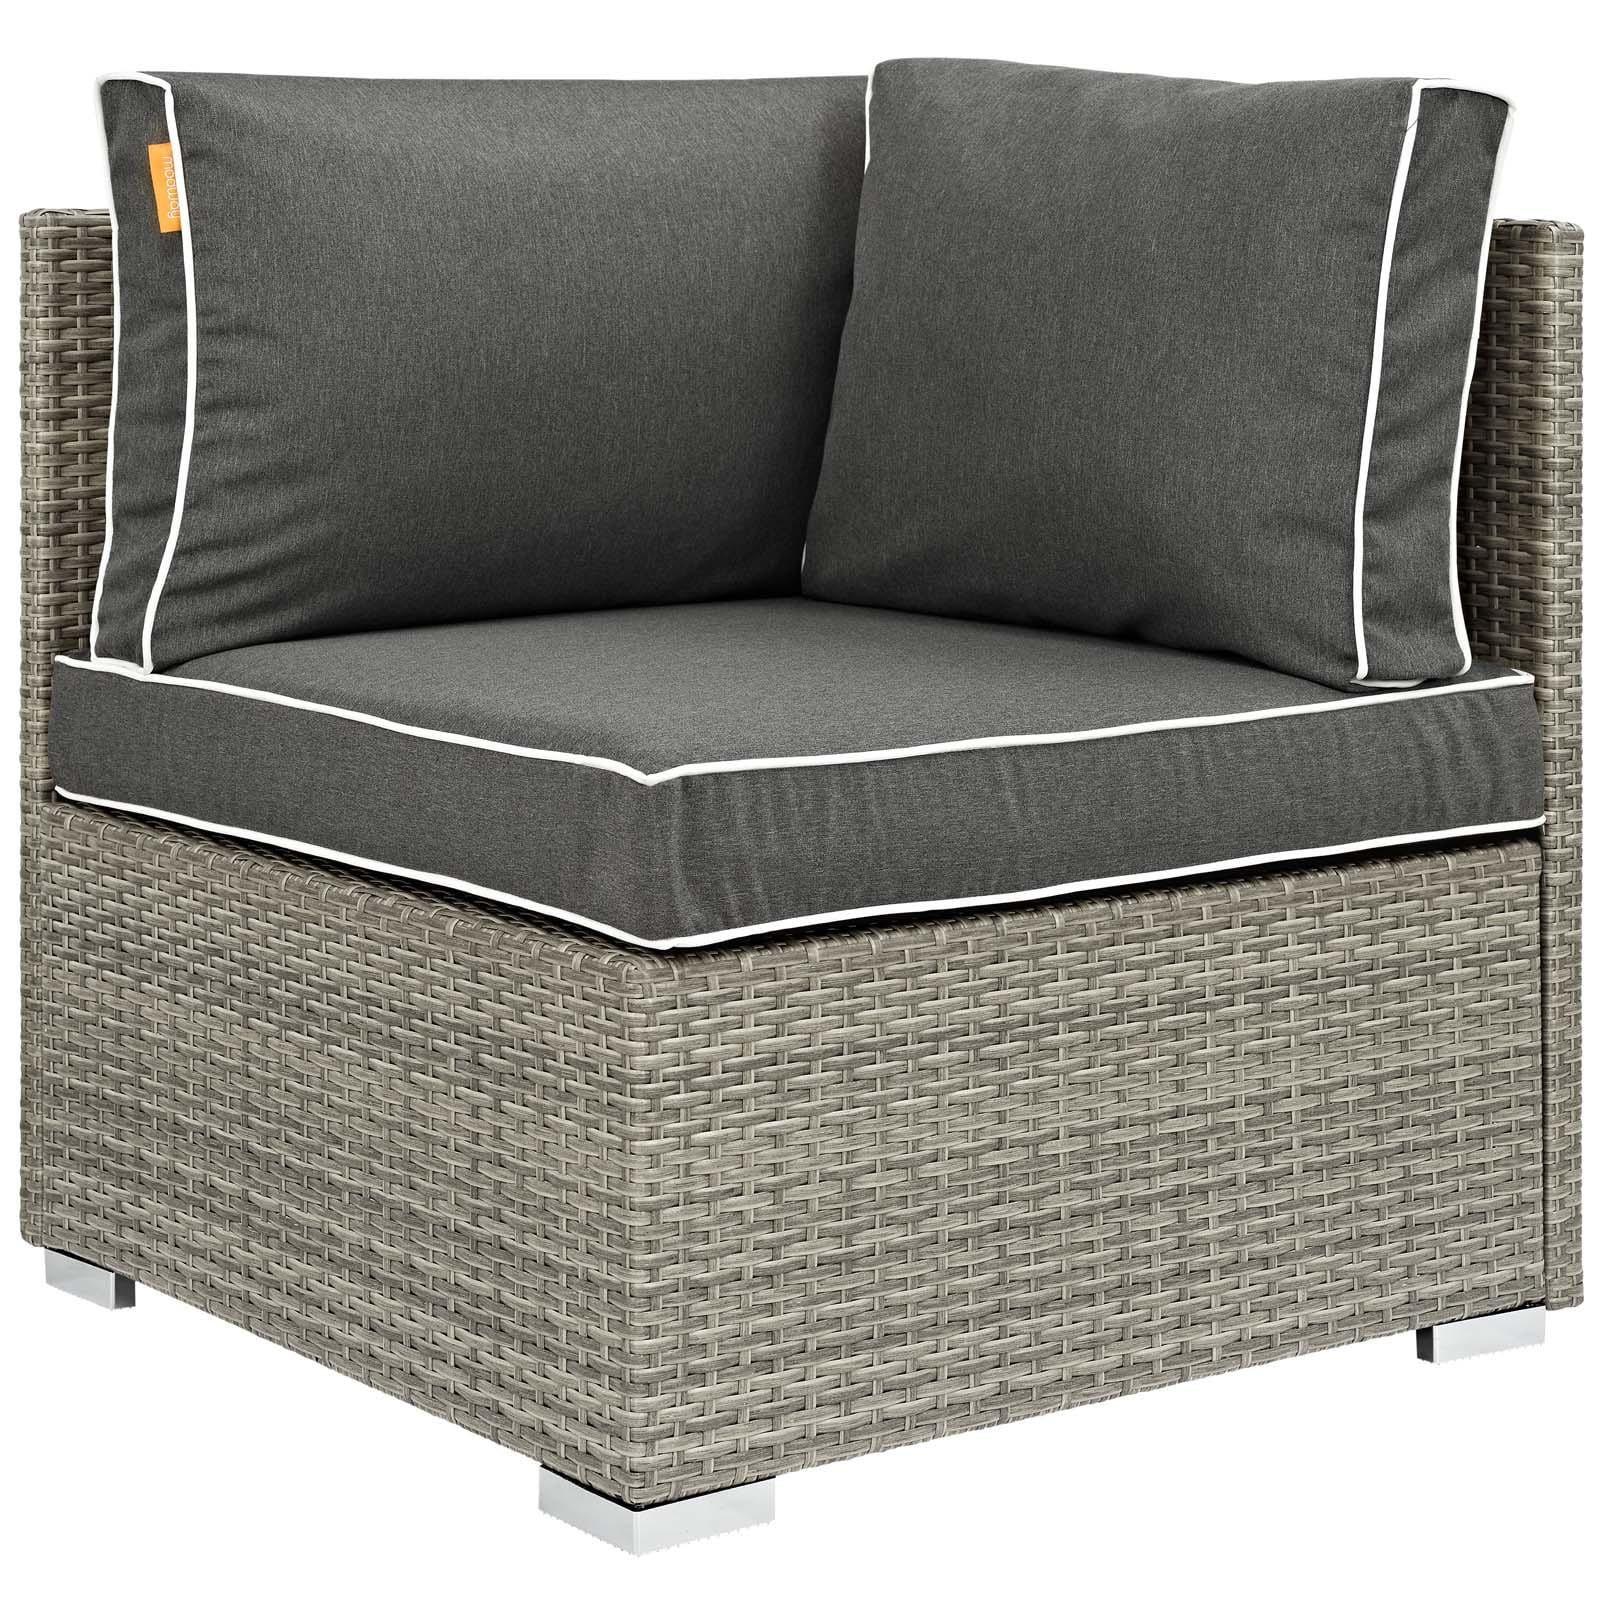 Modway Convene Wicker Rattan 5 Piece Outdoor Patio Furniture Set